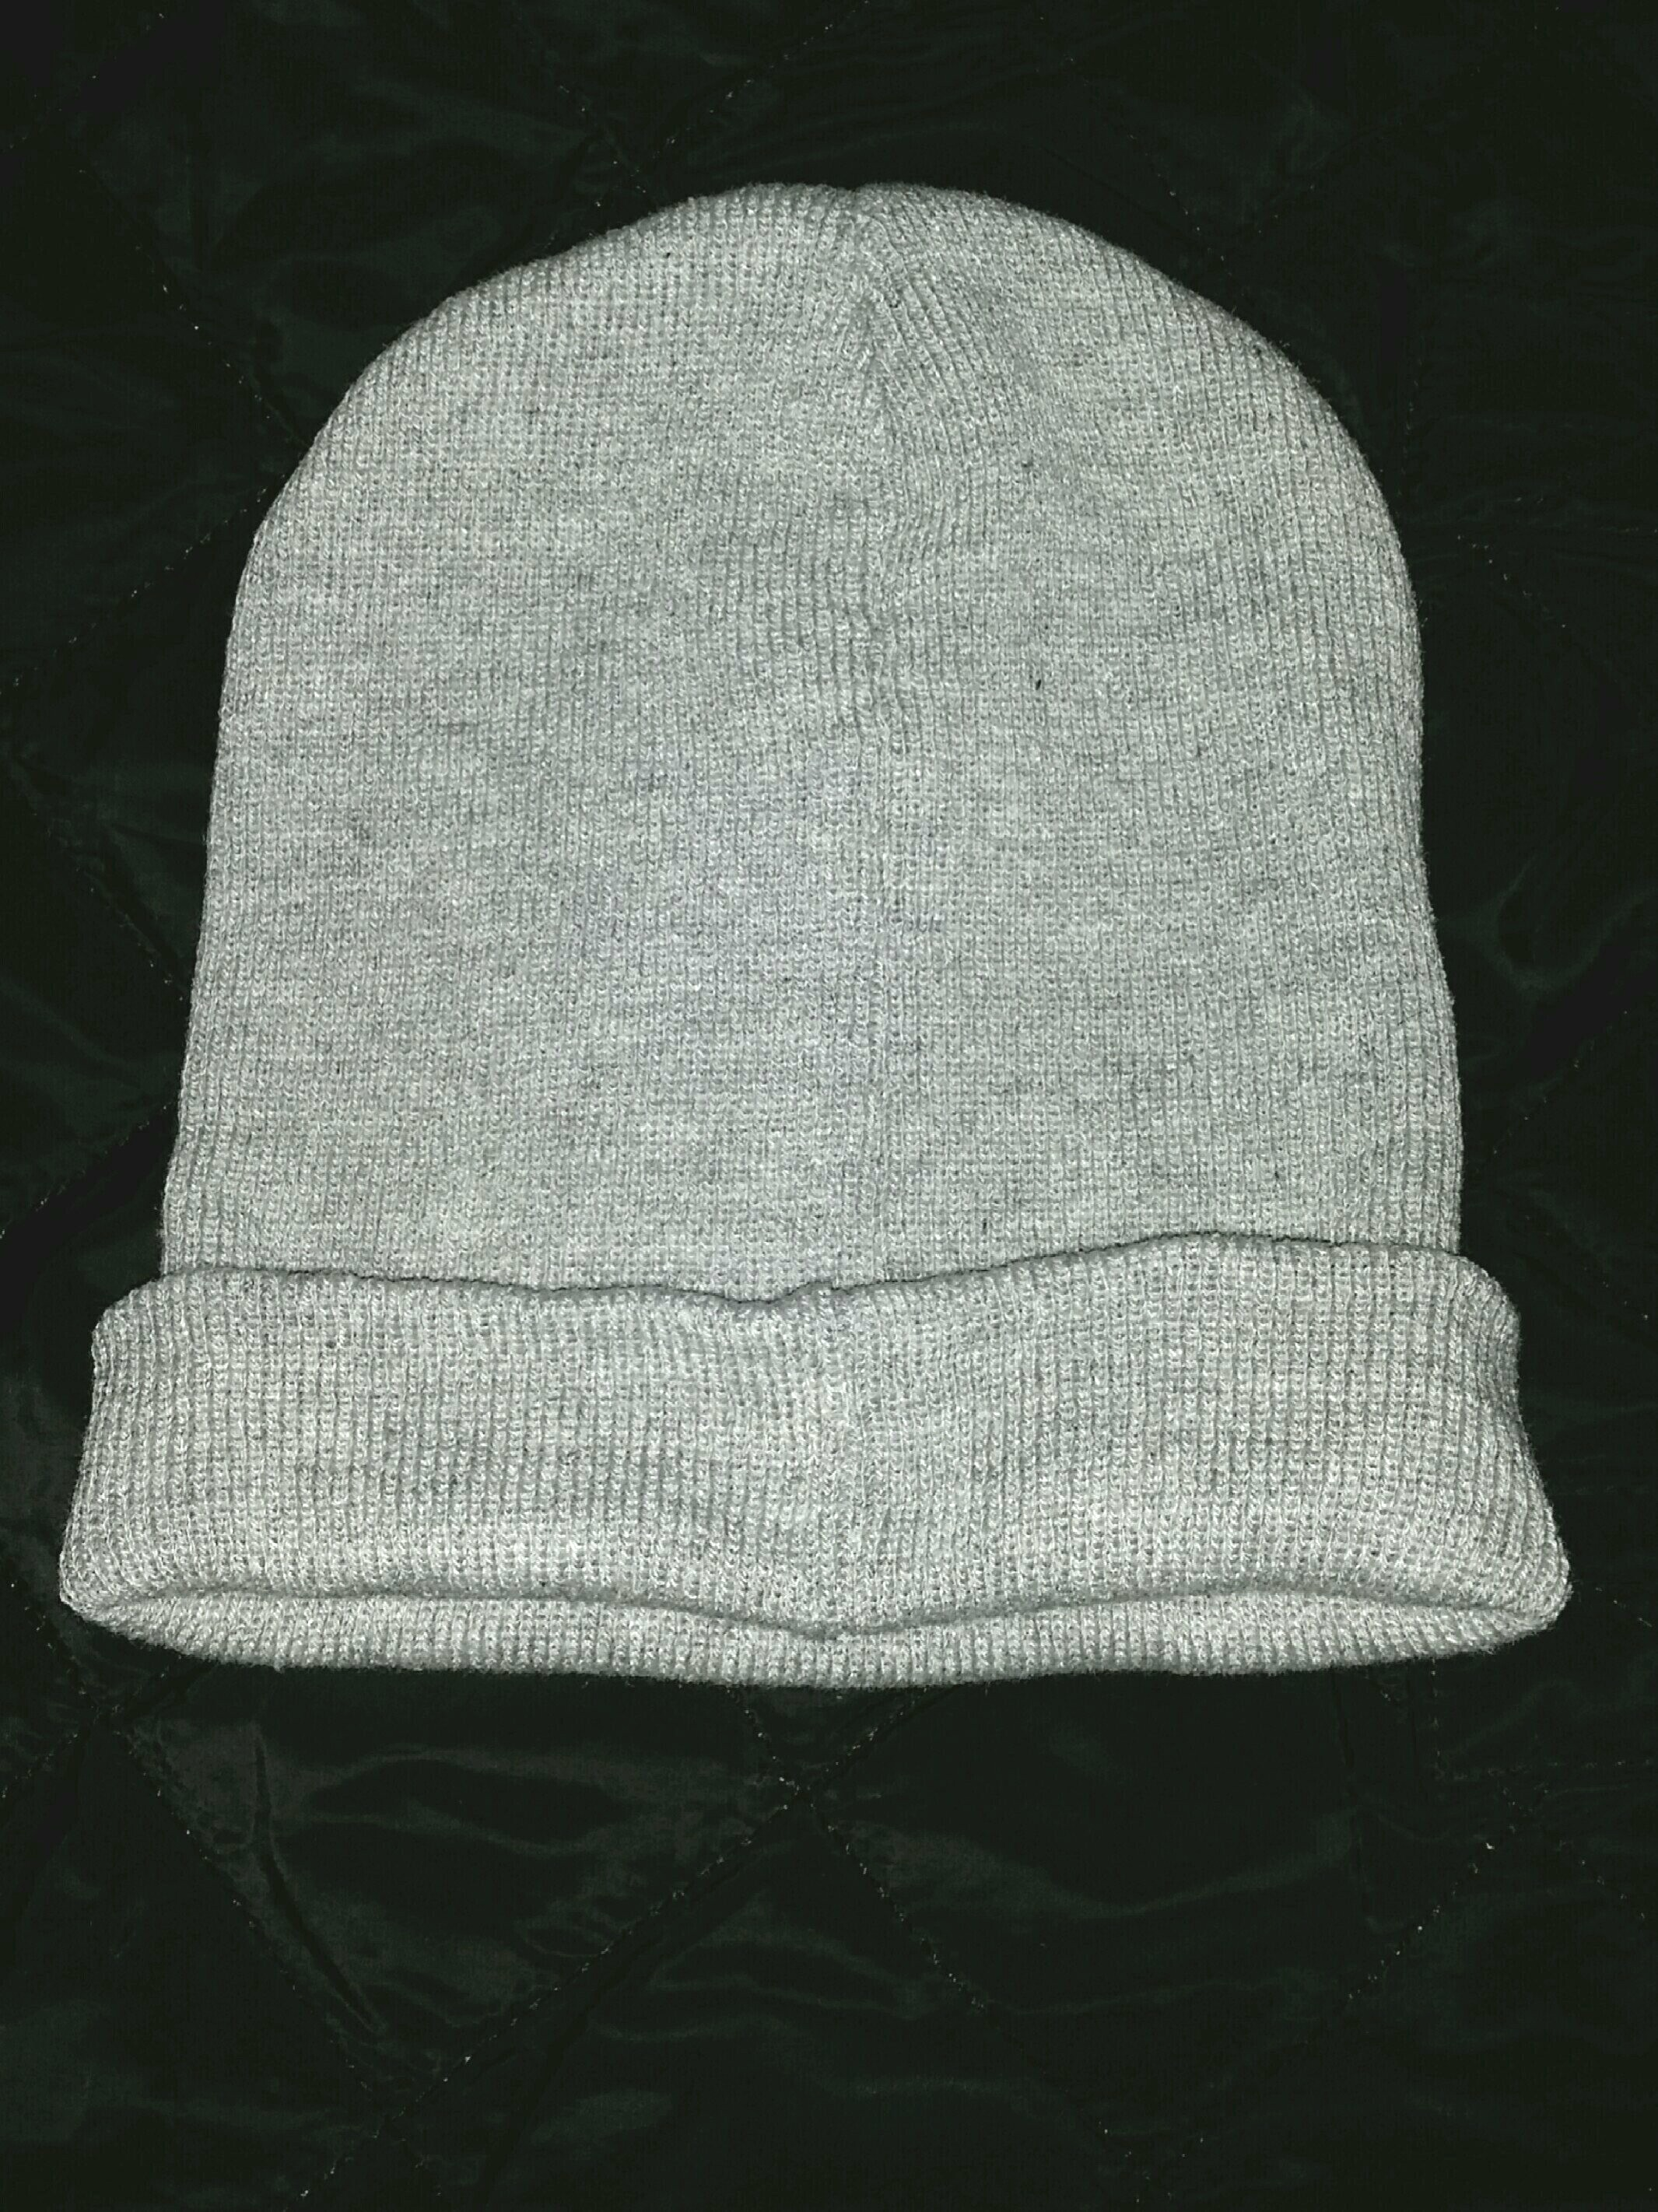 e647057b404 Home · Men s Fashion · Accessories · Caps   Hats. photo photo photo